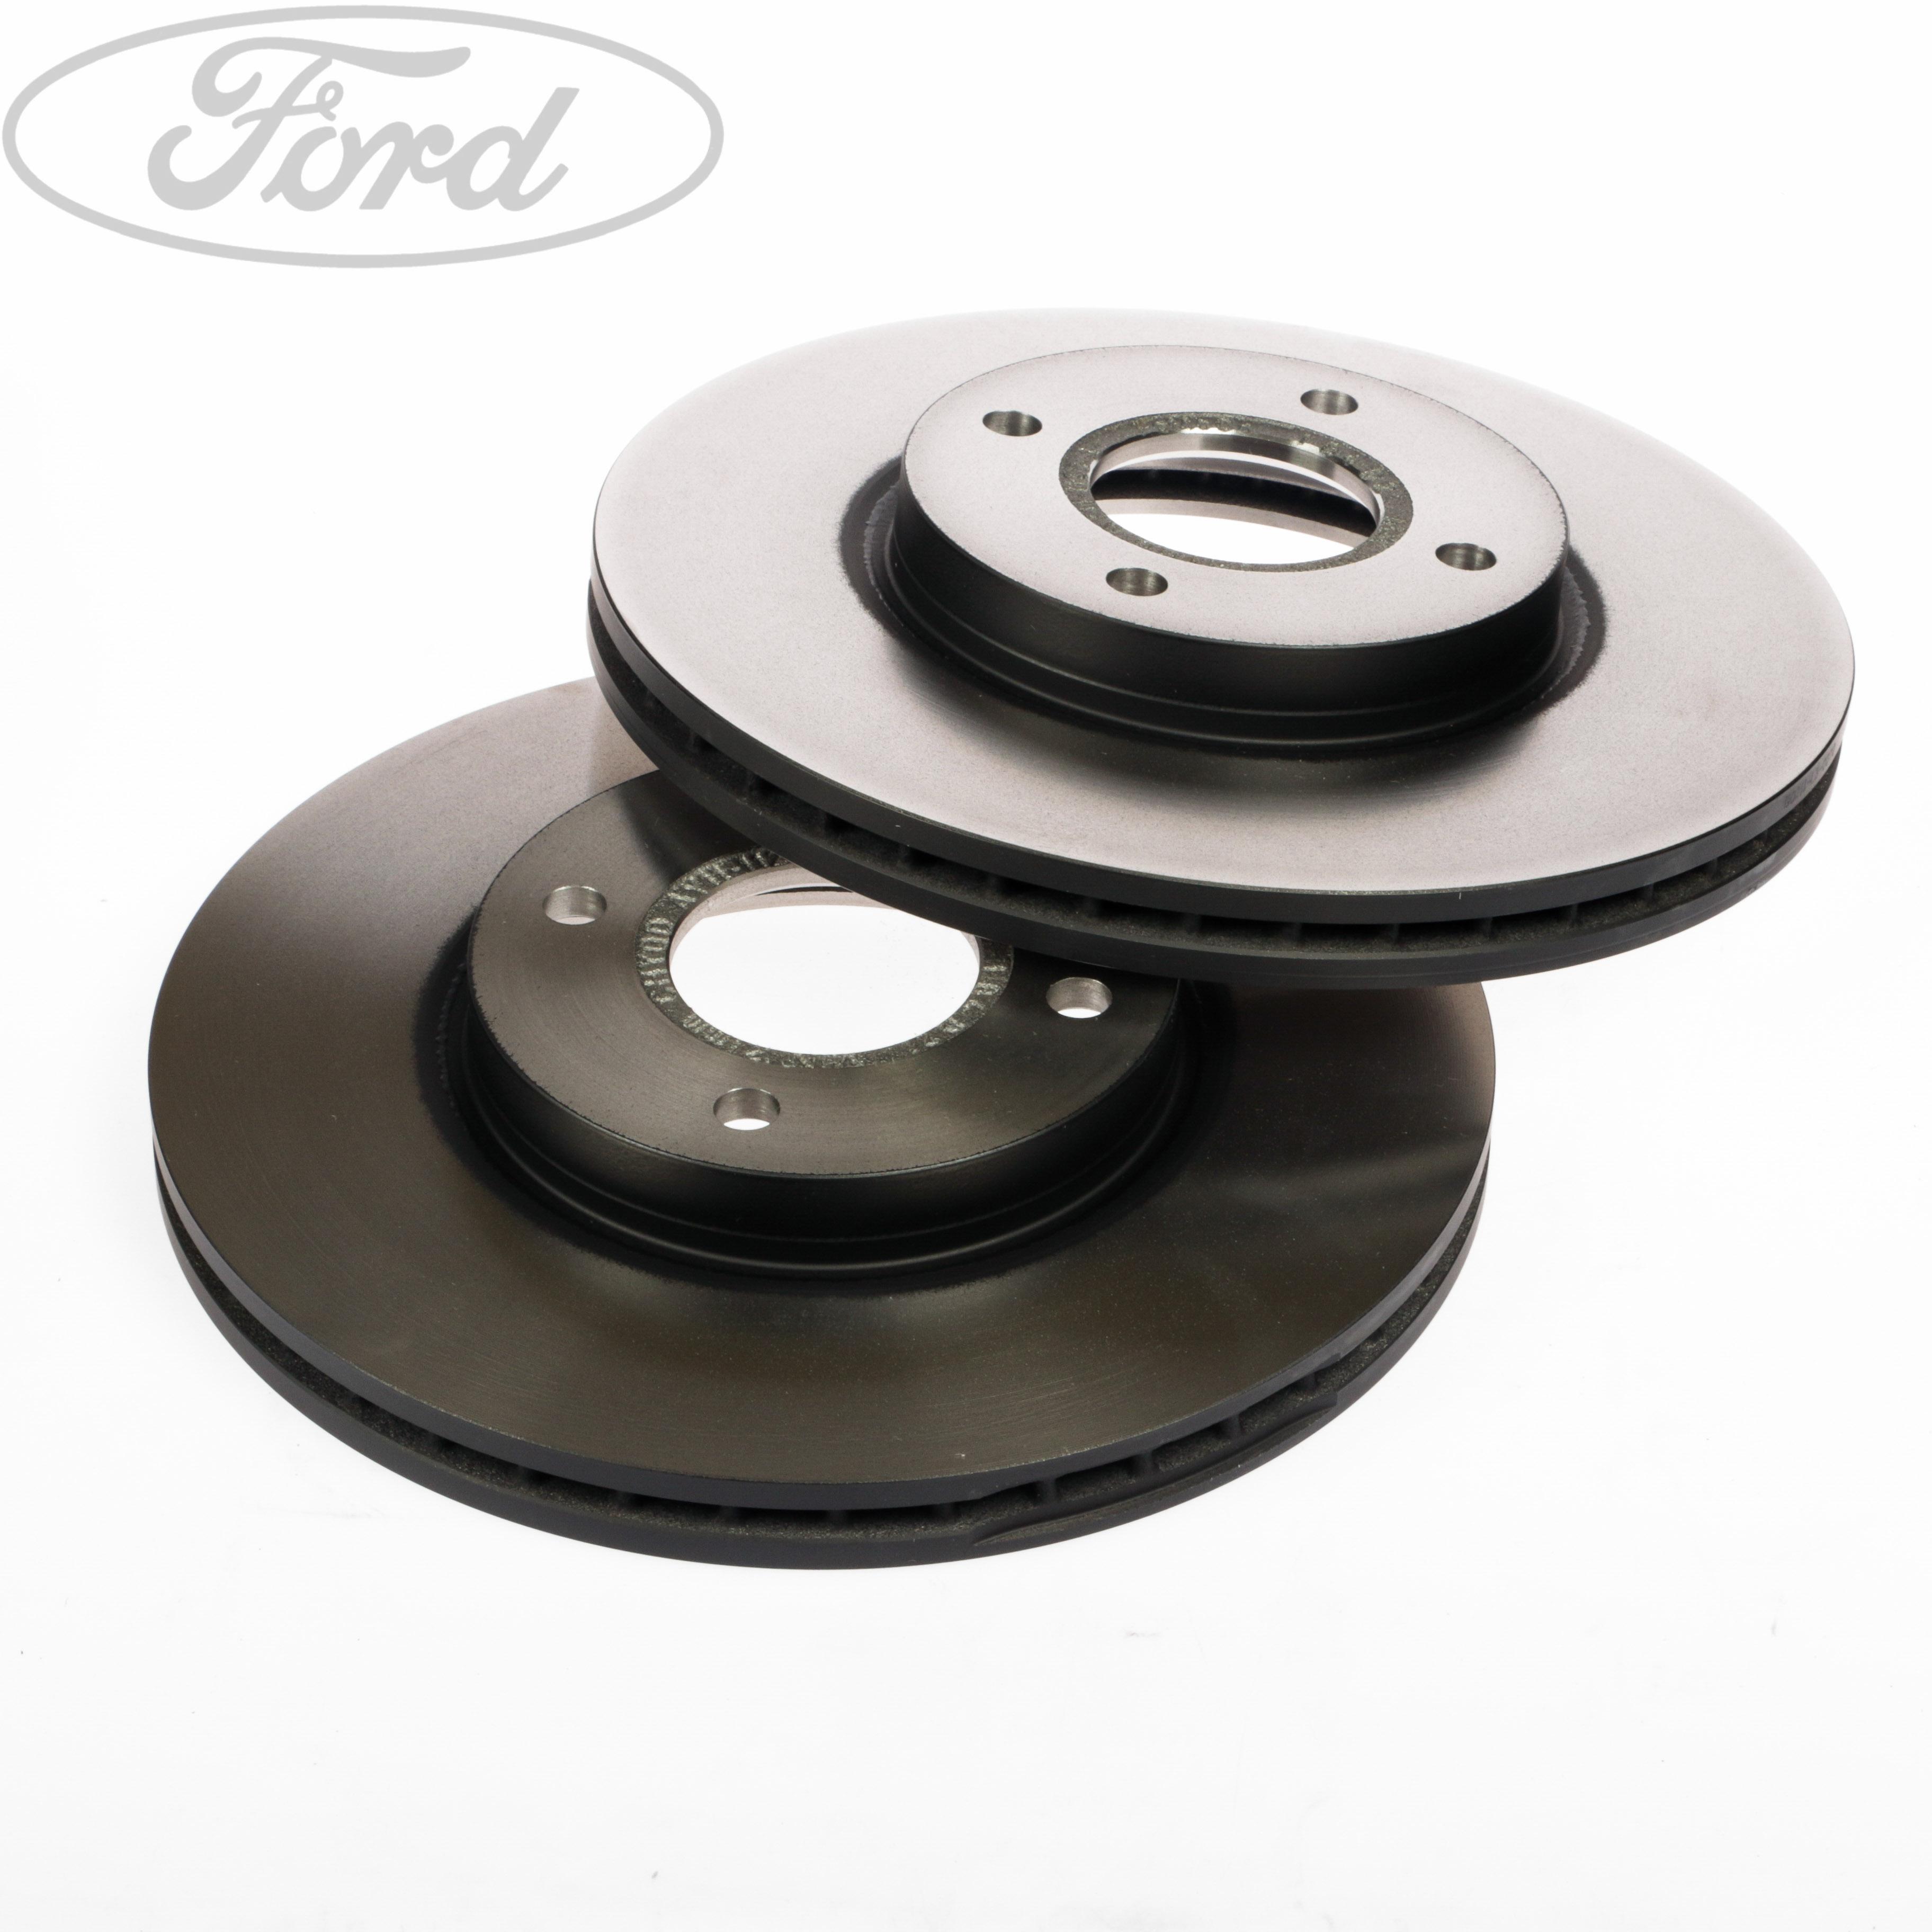 genuine ford fiesta mk7 st front vented brake discs 278mm 4 stud pair 1751584. Black Bedroom Furniture Sets. Home Design Ideas